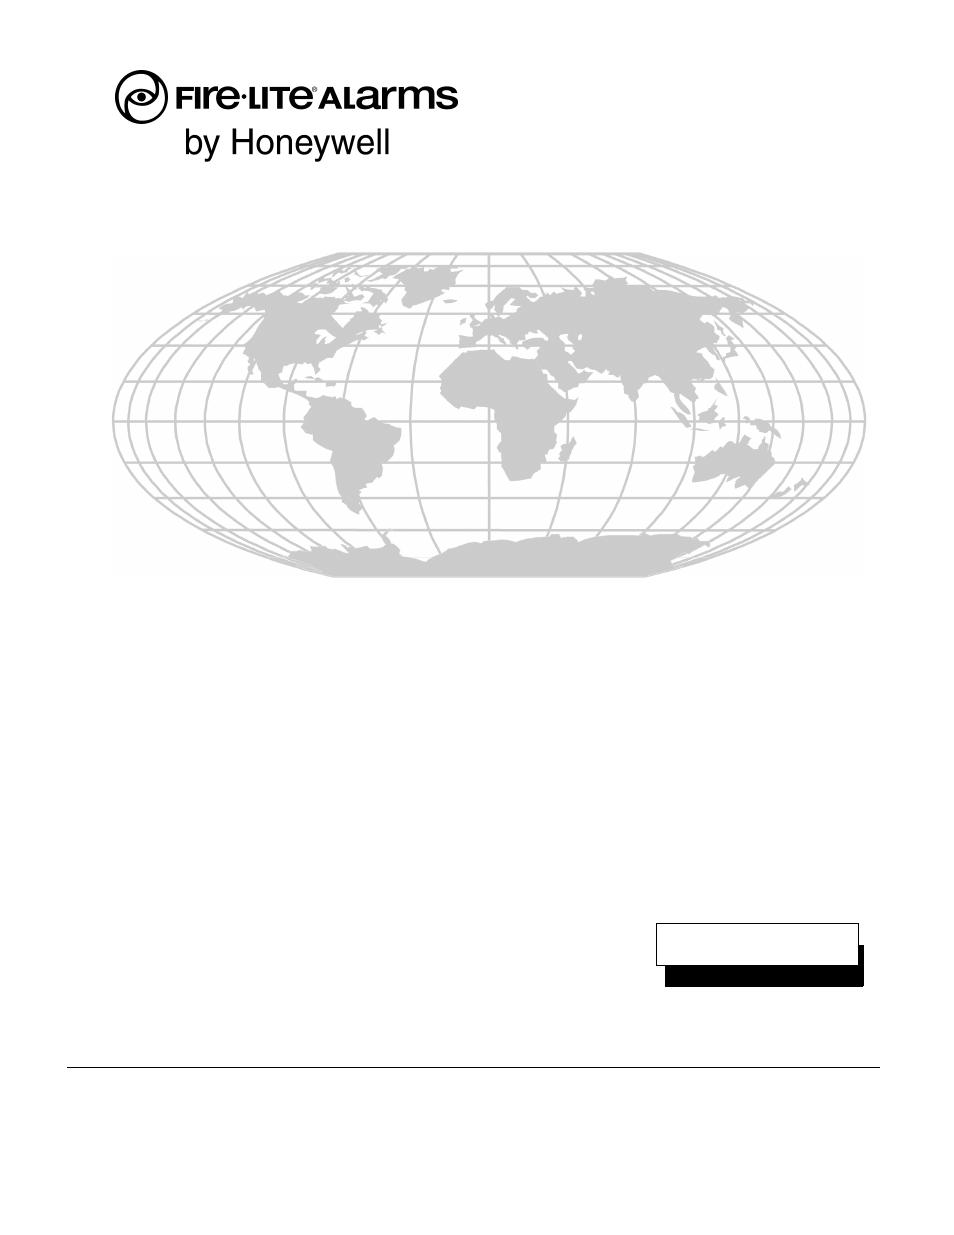 Fire-Lite MS-25E Addressable Fire Control Panel User Manual